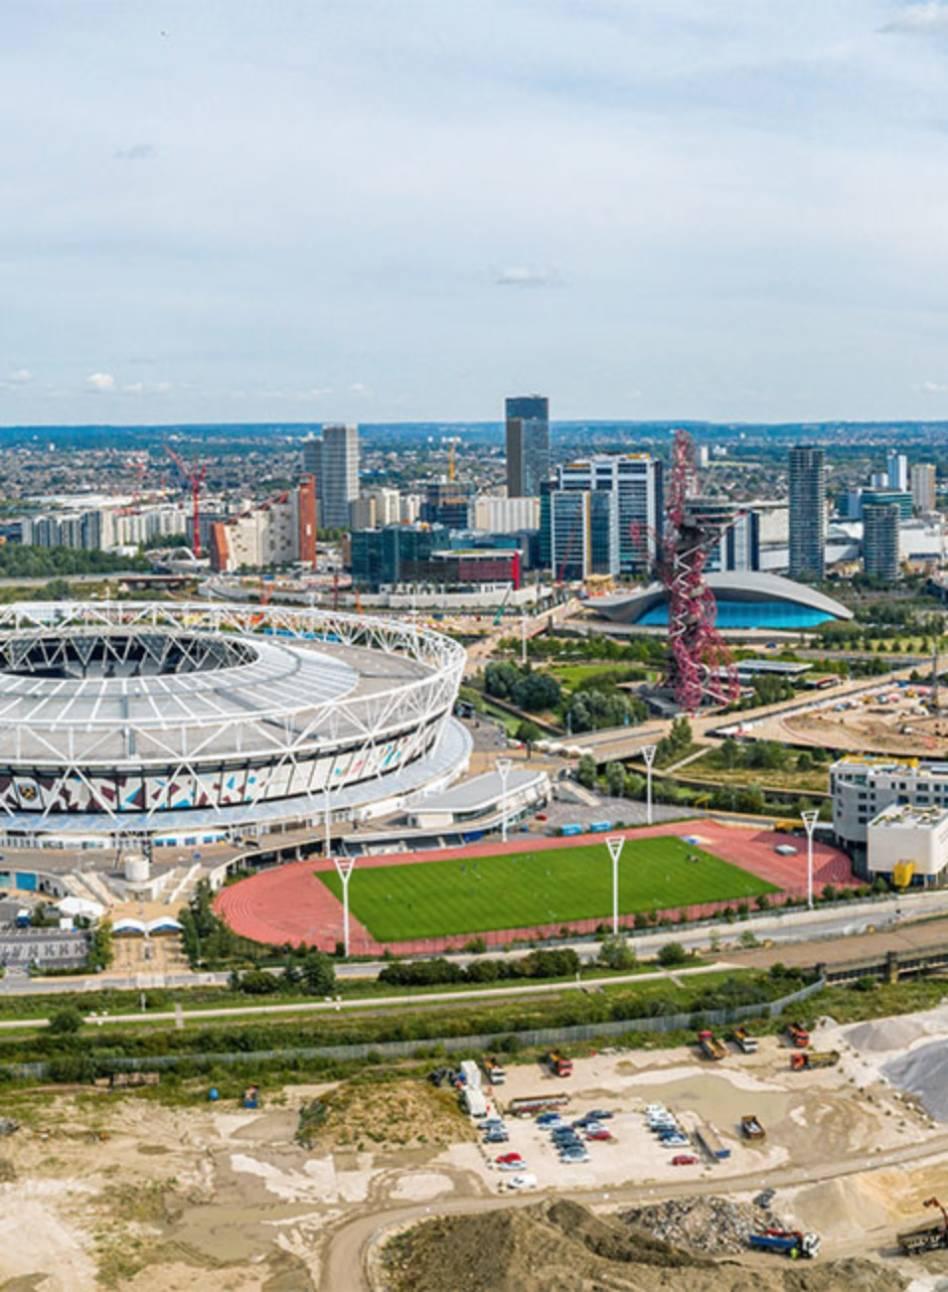 img-london-olympics-overlay.jpg